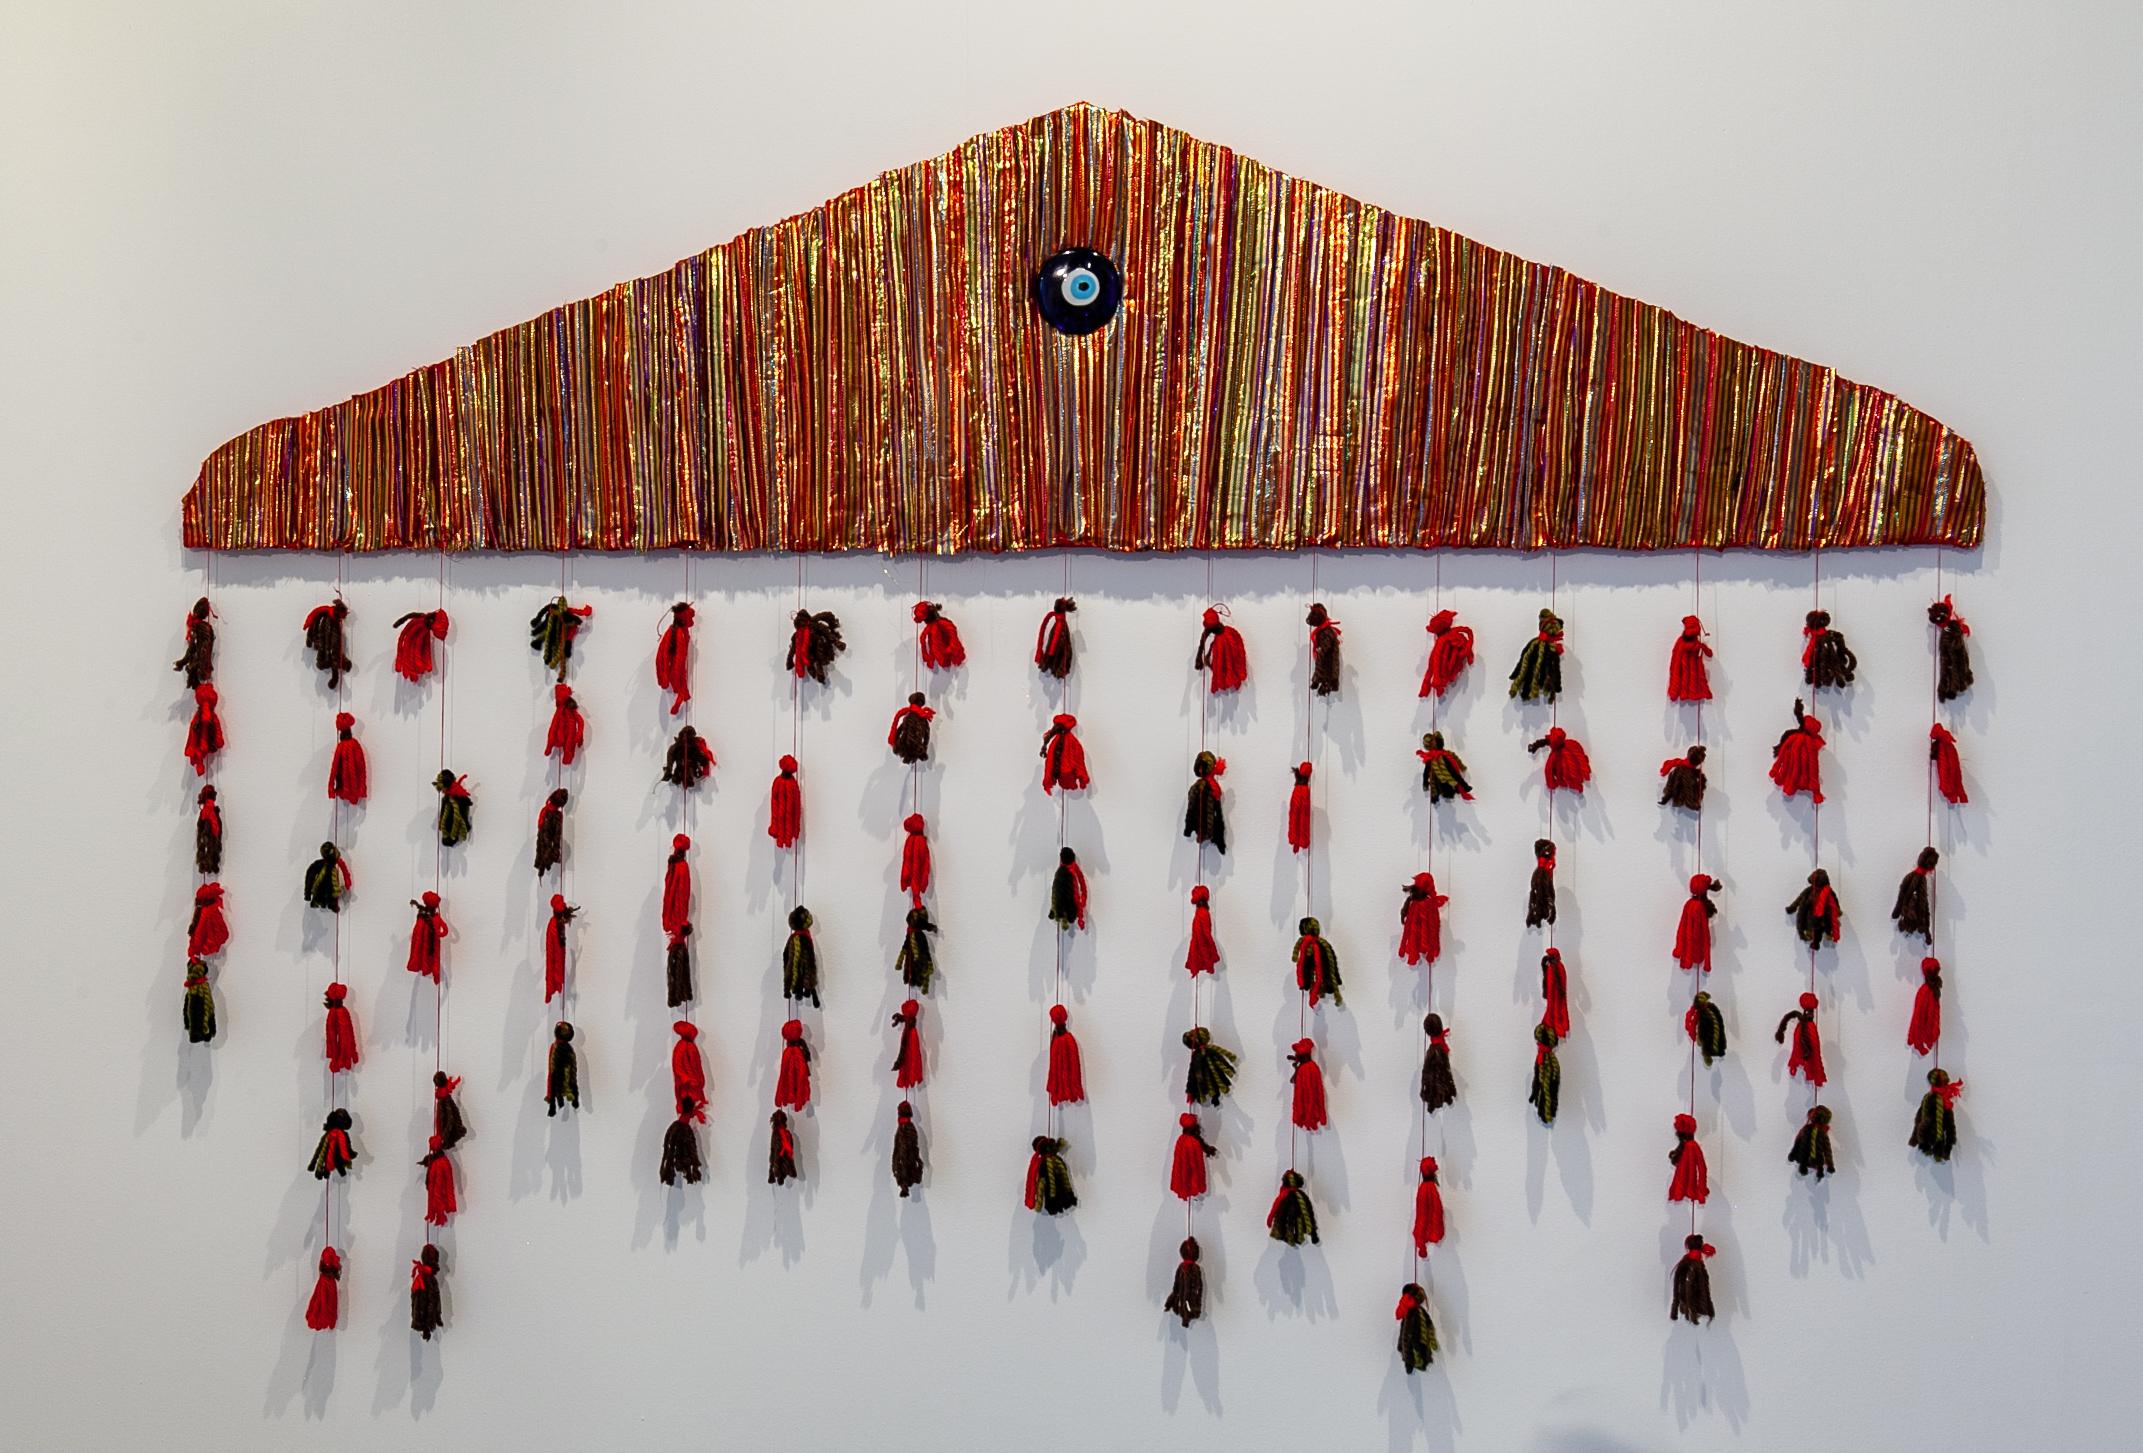 2019 Gallery — Young Collectors Contemporary